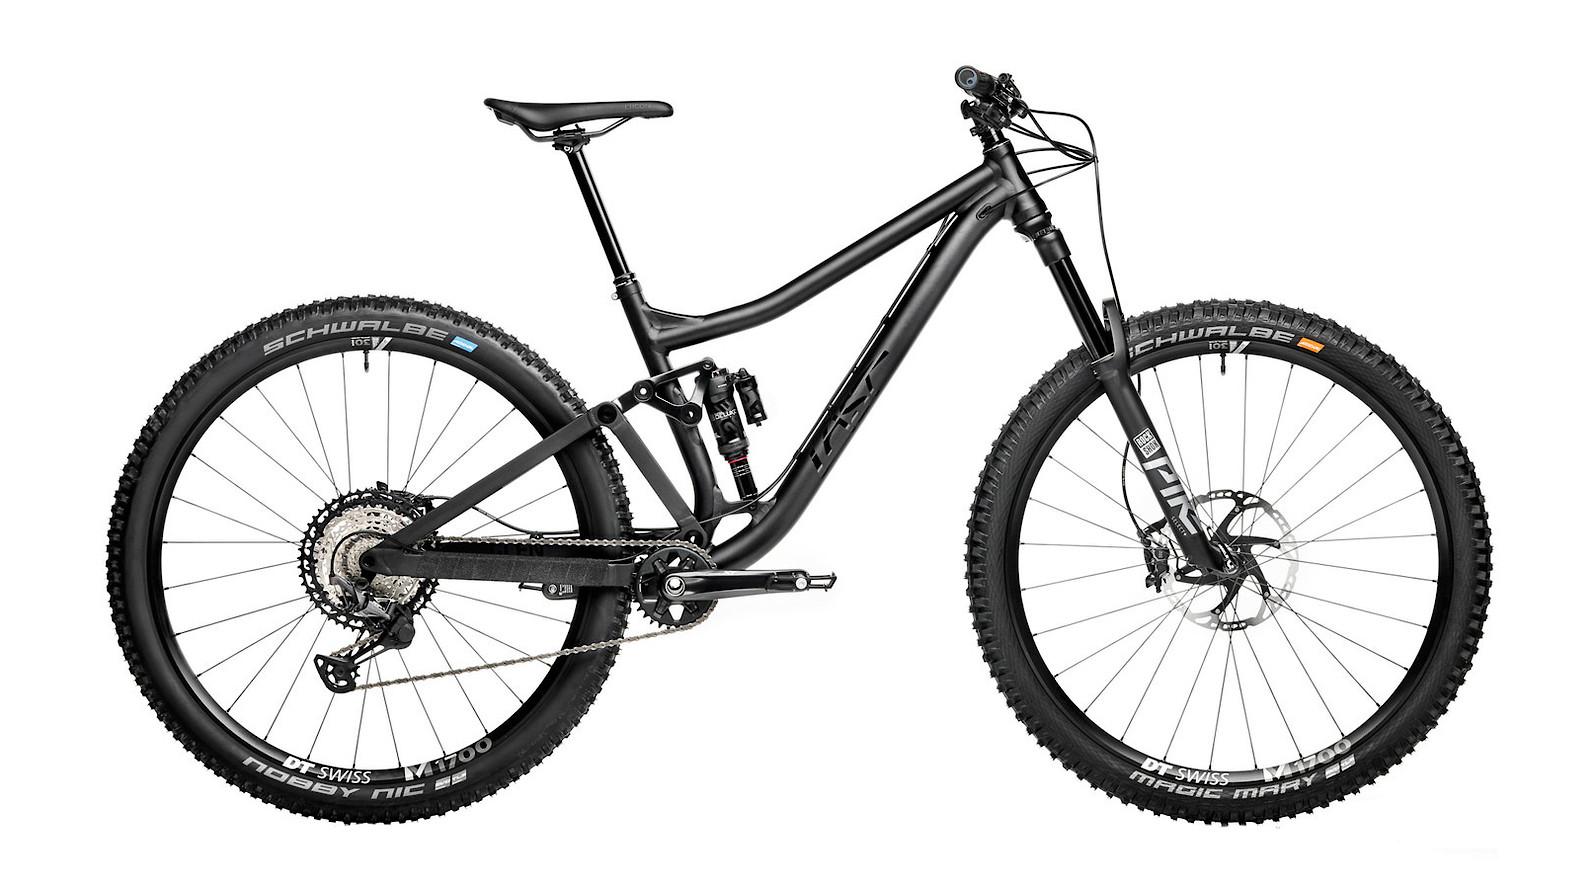 2020 Last Glen Trail XT (Anodized Black)